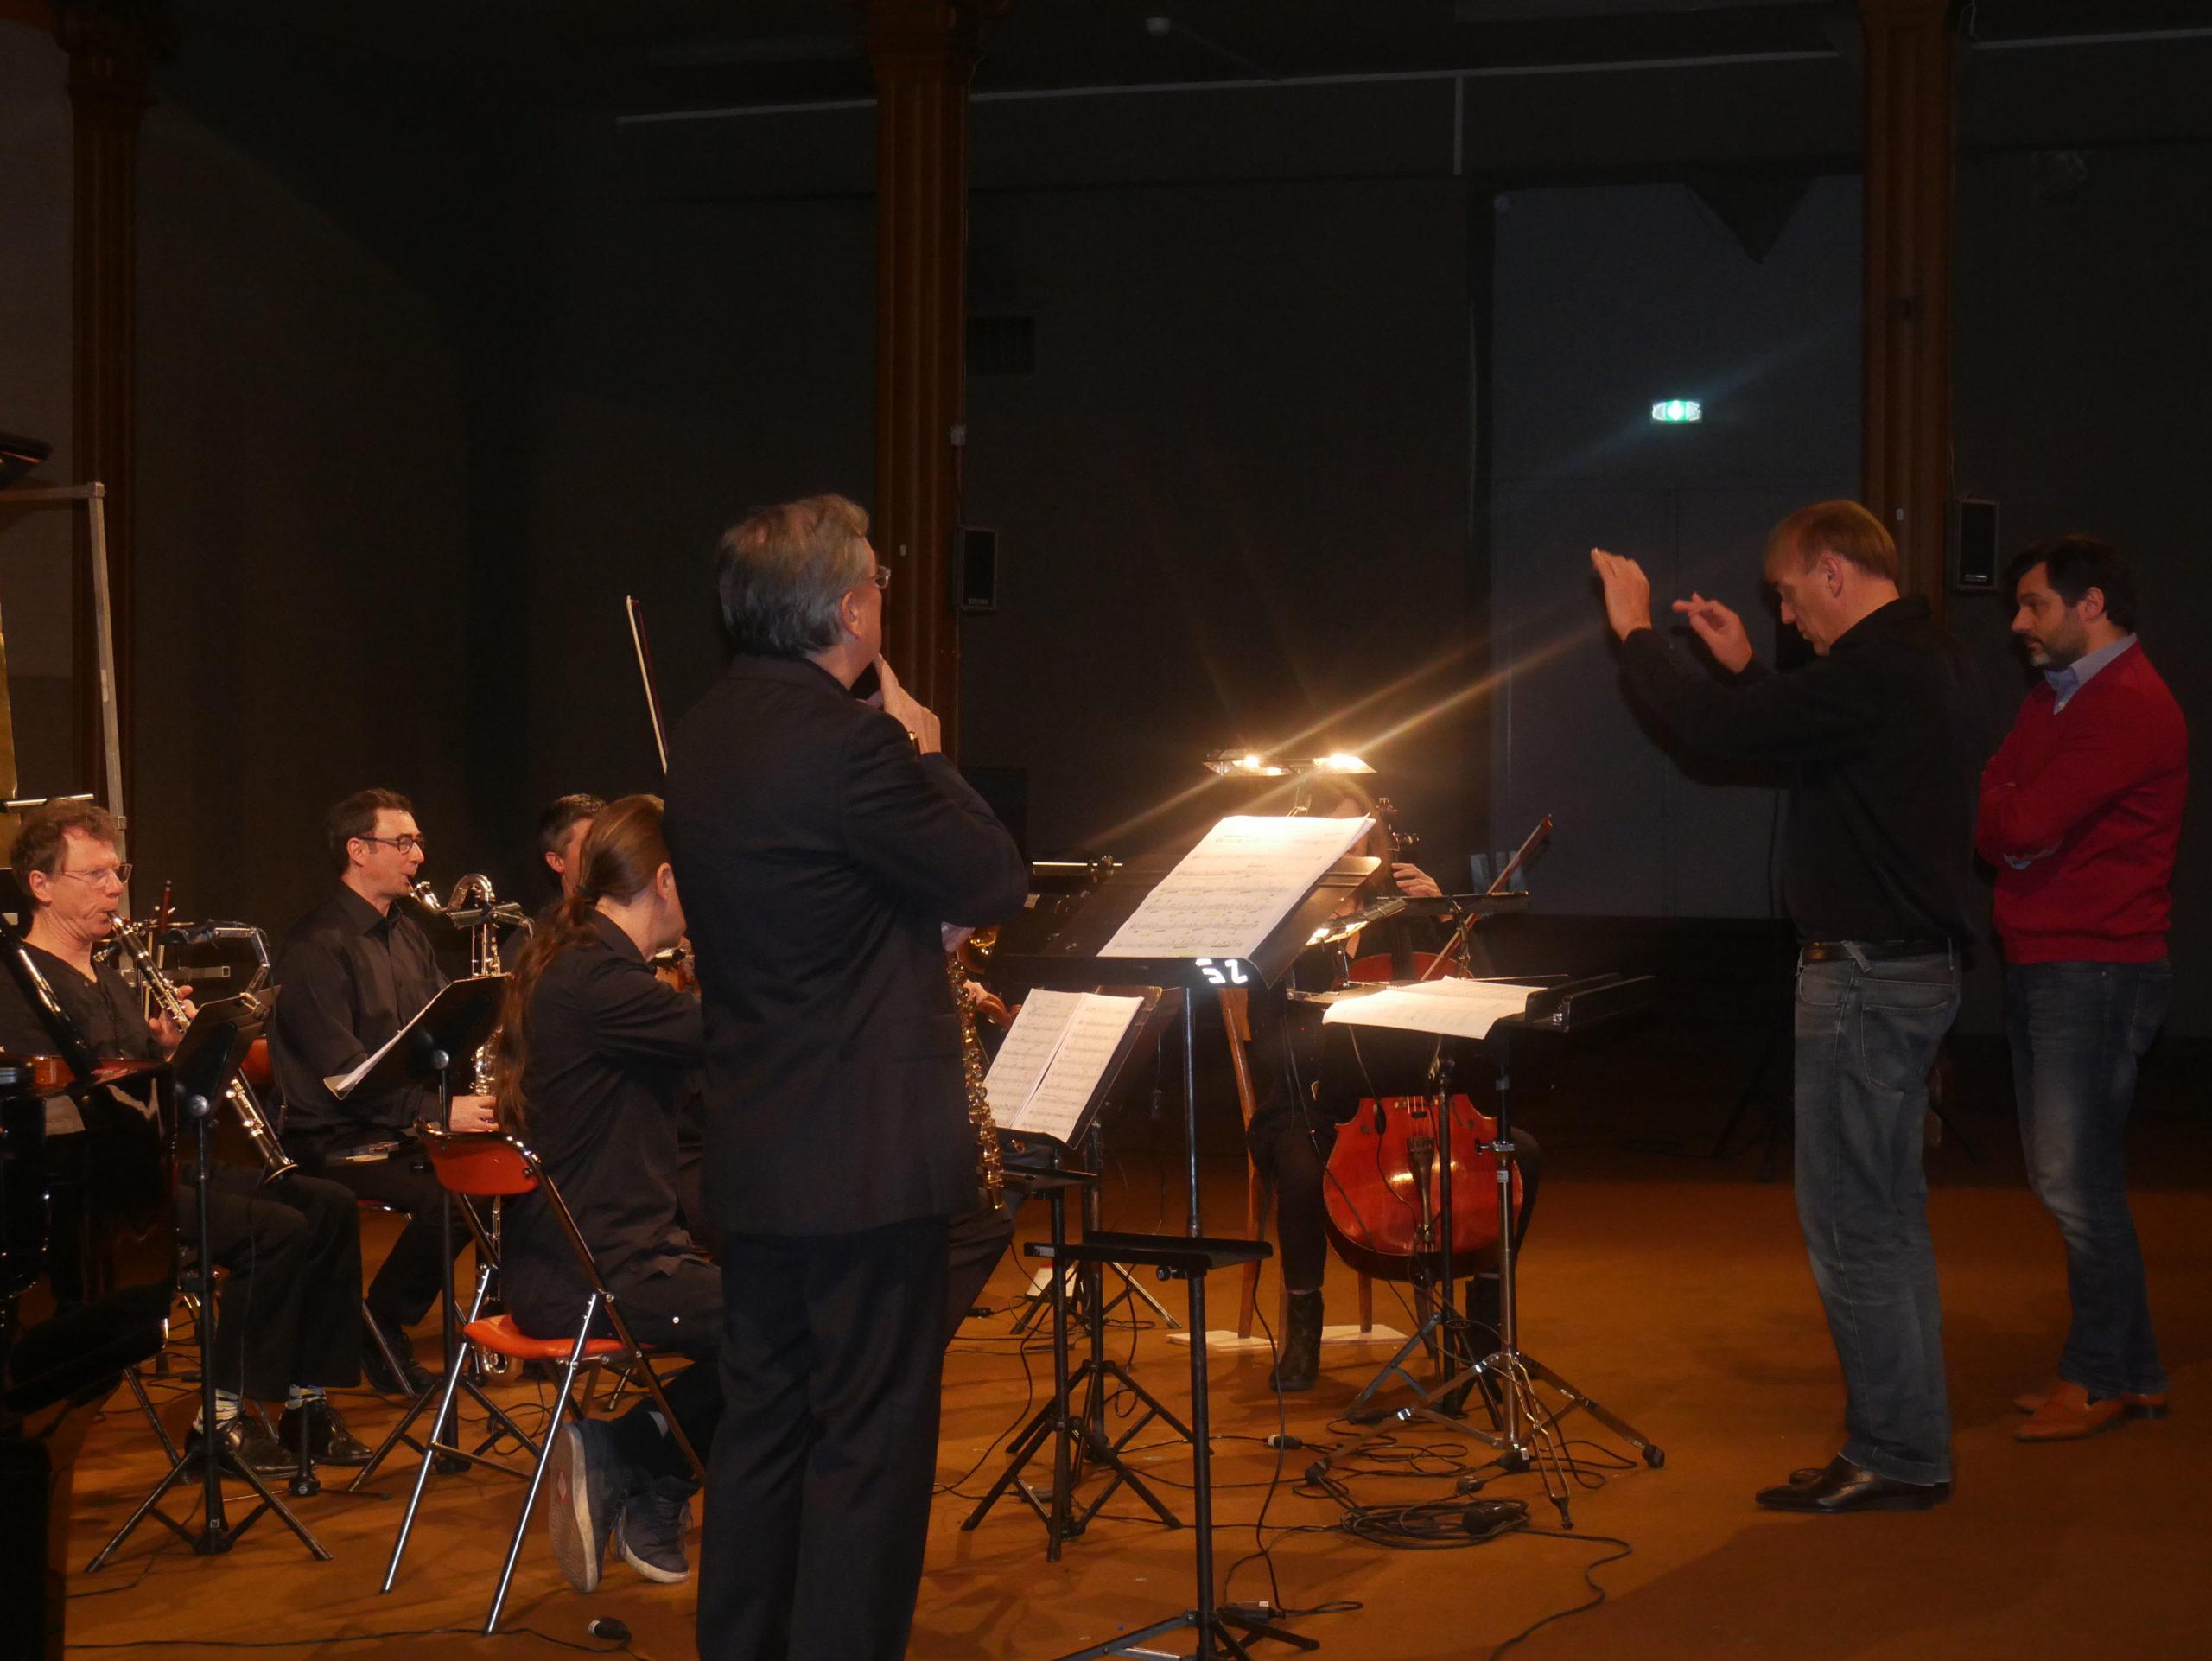 Horos with the Ensemble Orchestral Contemporain, cond. Daniel Kawka